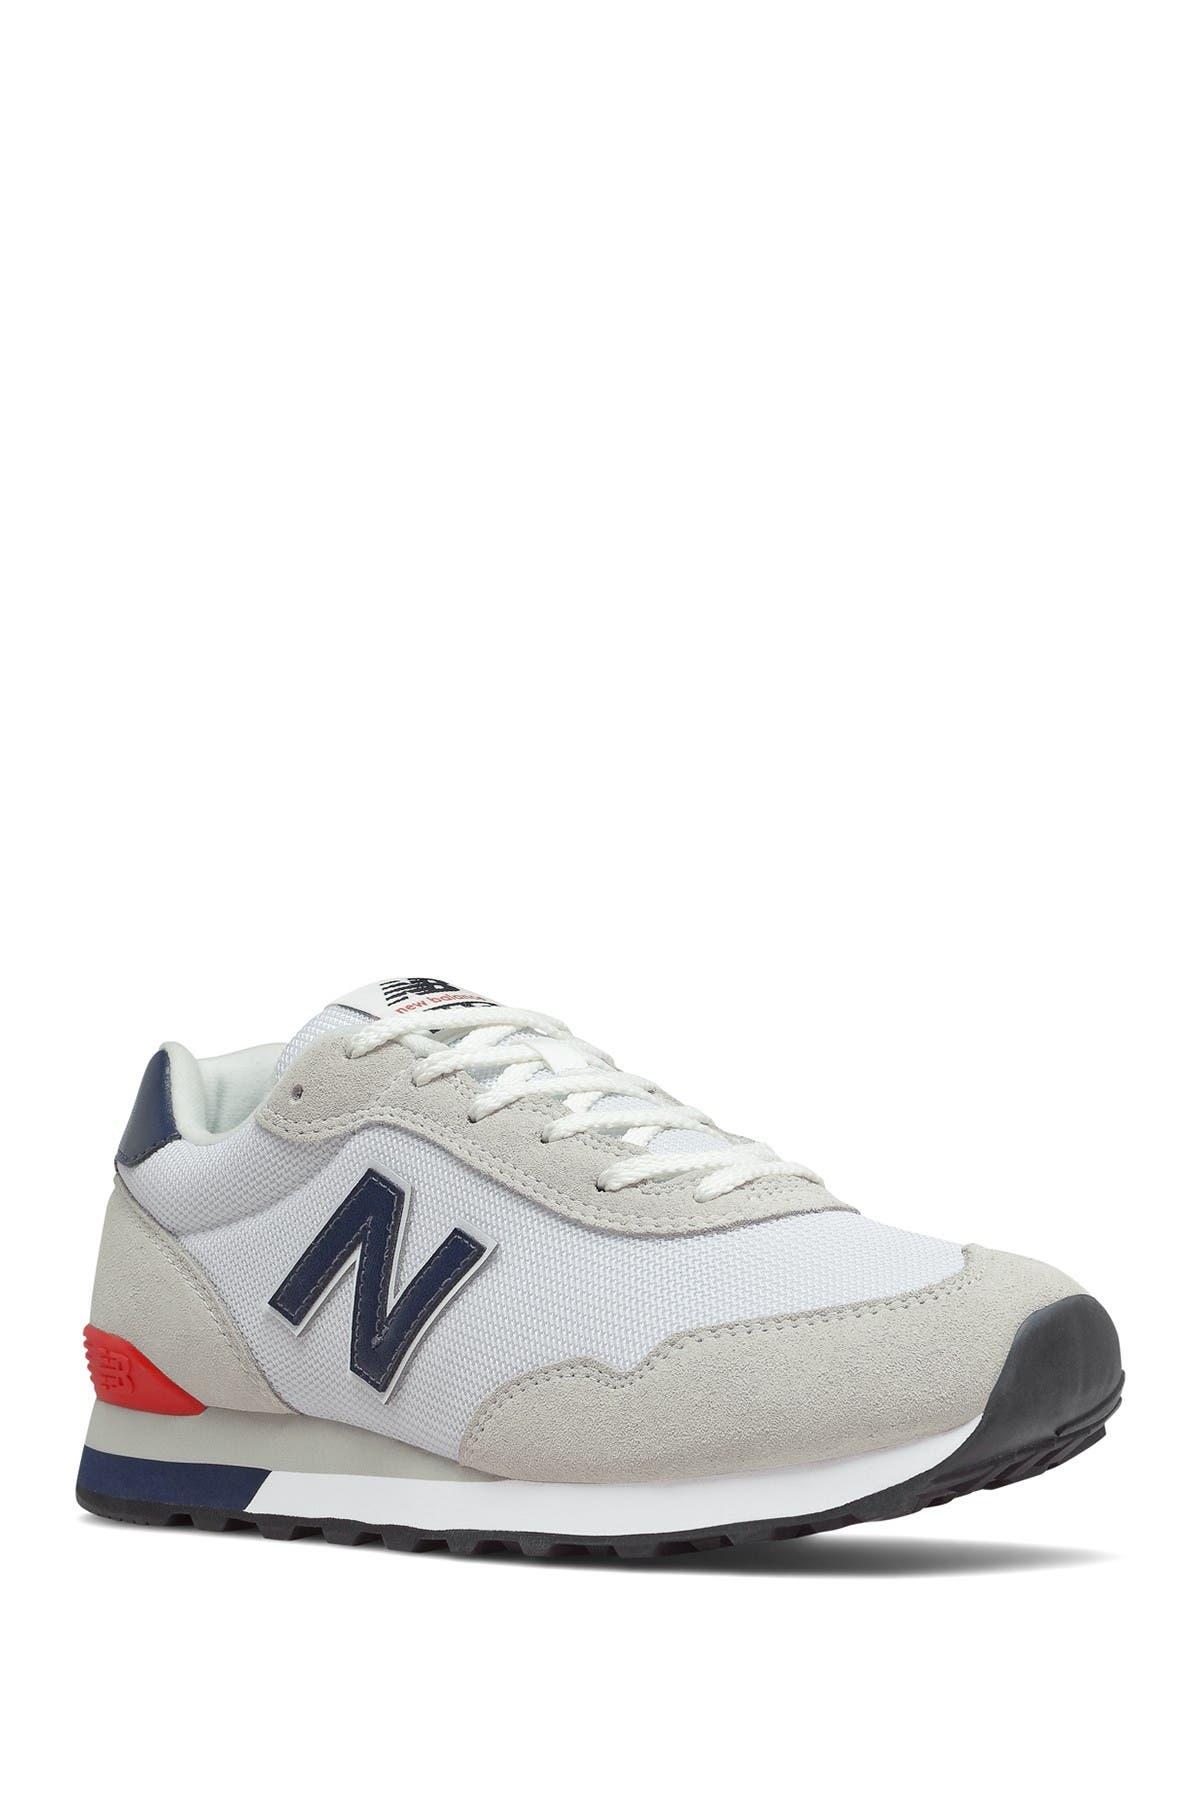 Image of New Balance 515 Classic Running Sneaker